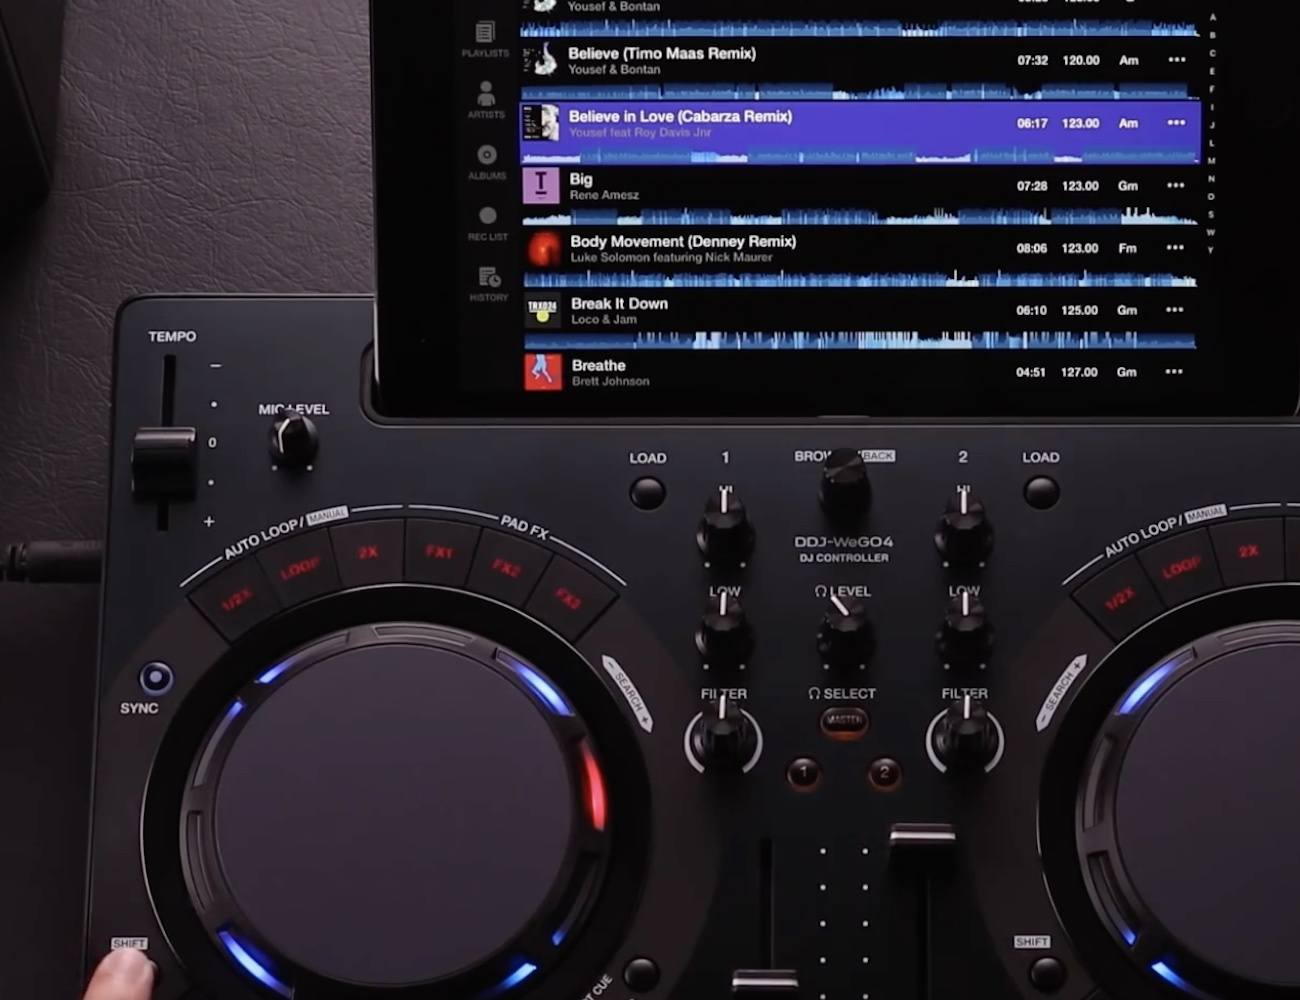 Pioneer Compact DJ Software Controller